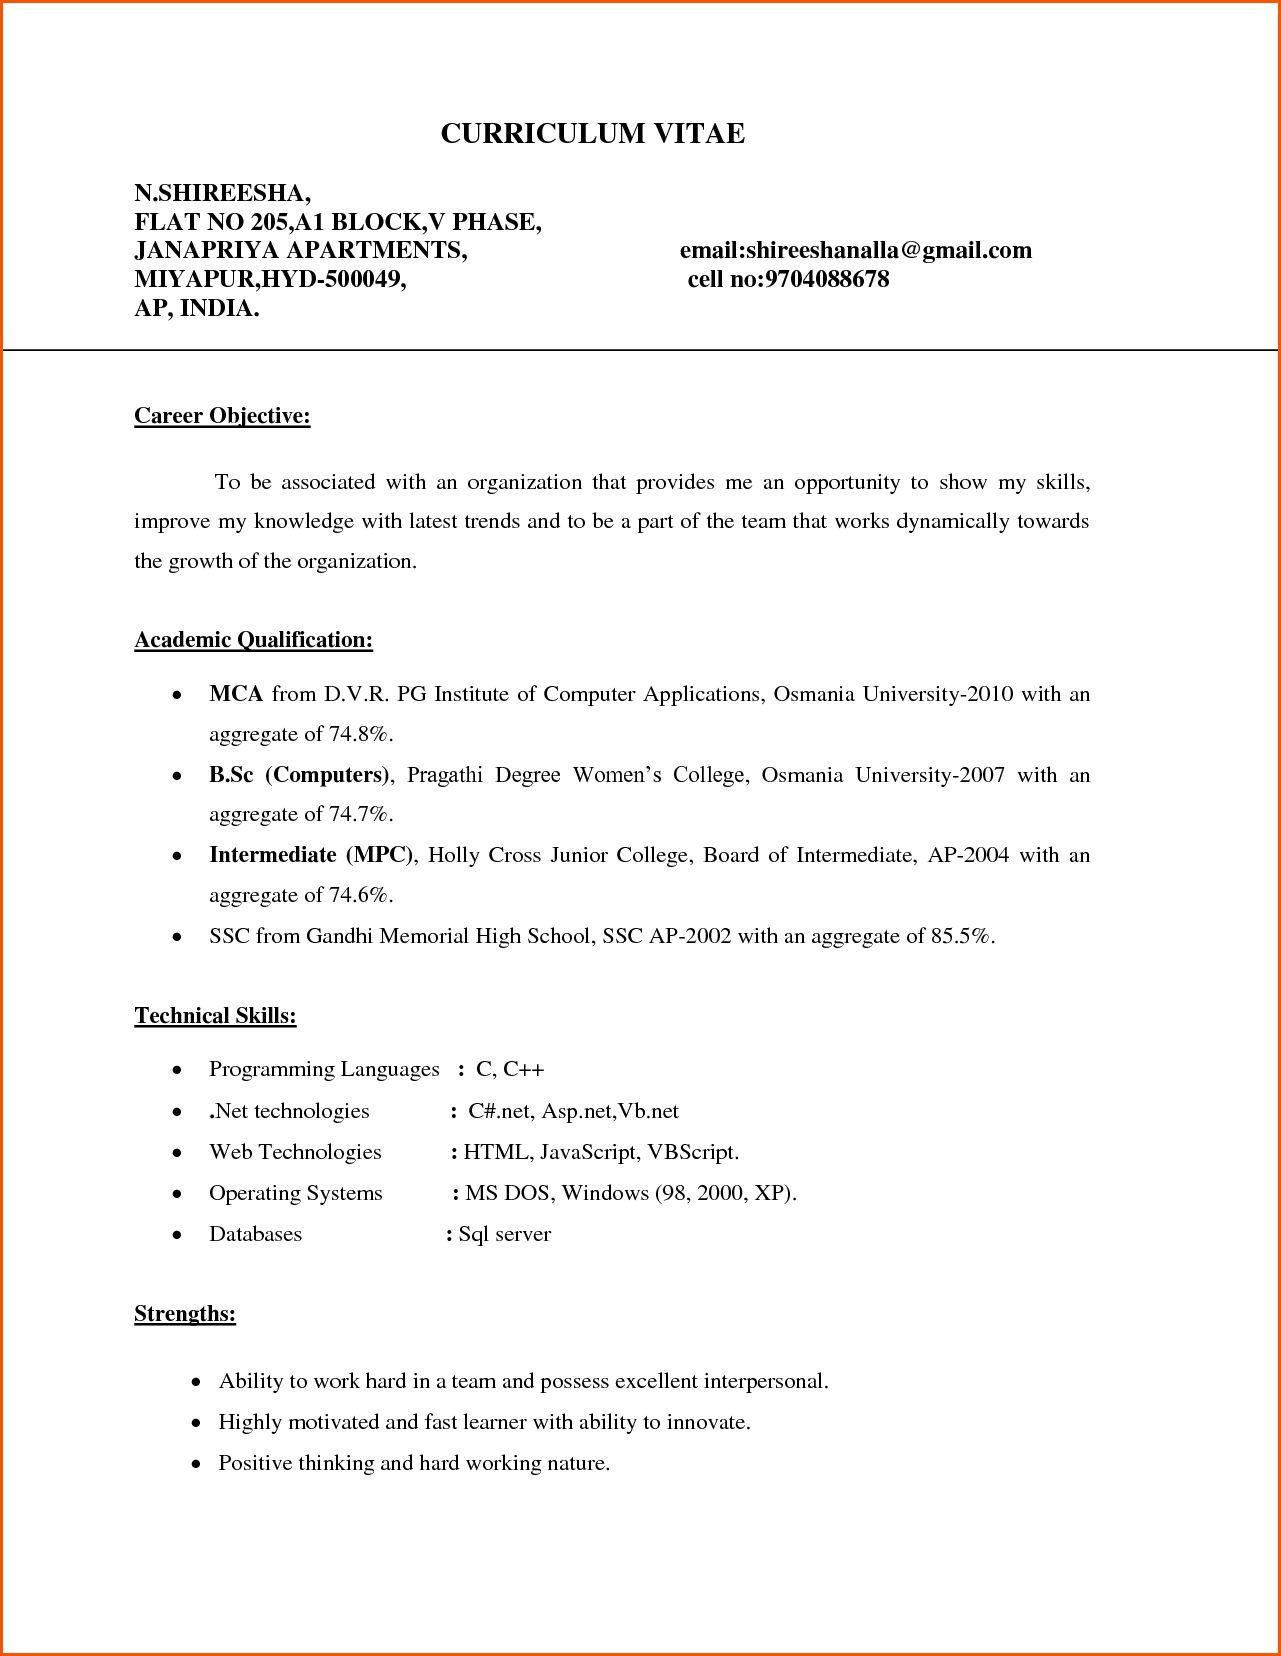 Mca Fresher Resume Format Informative essay, Curriculum